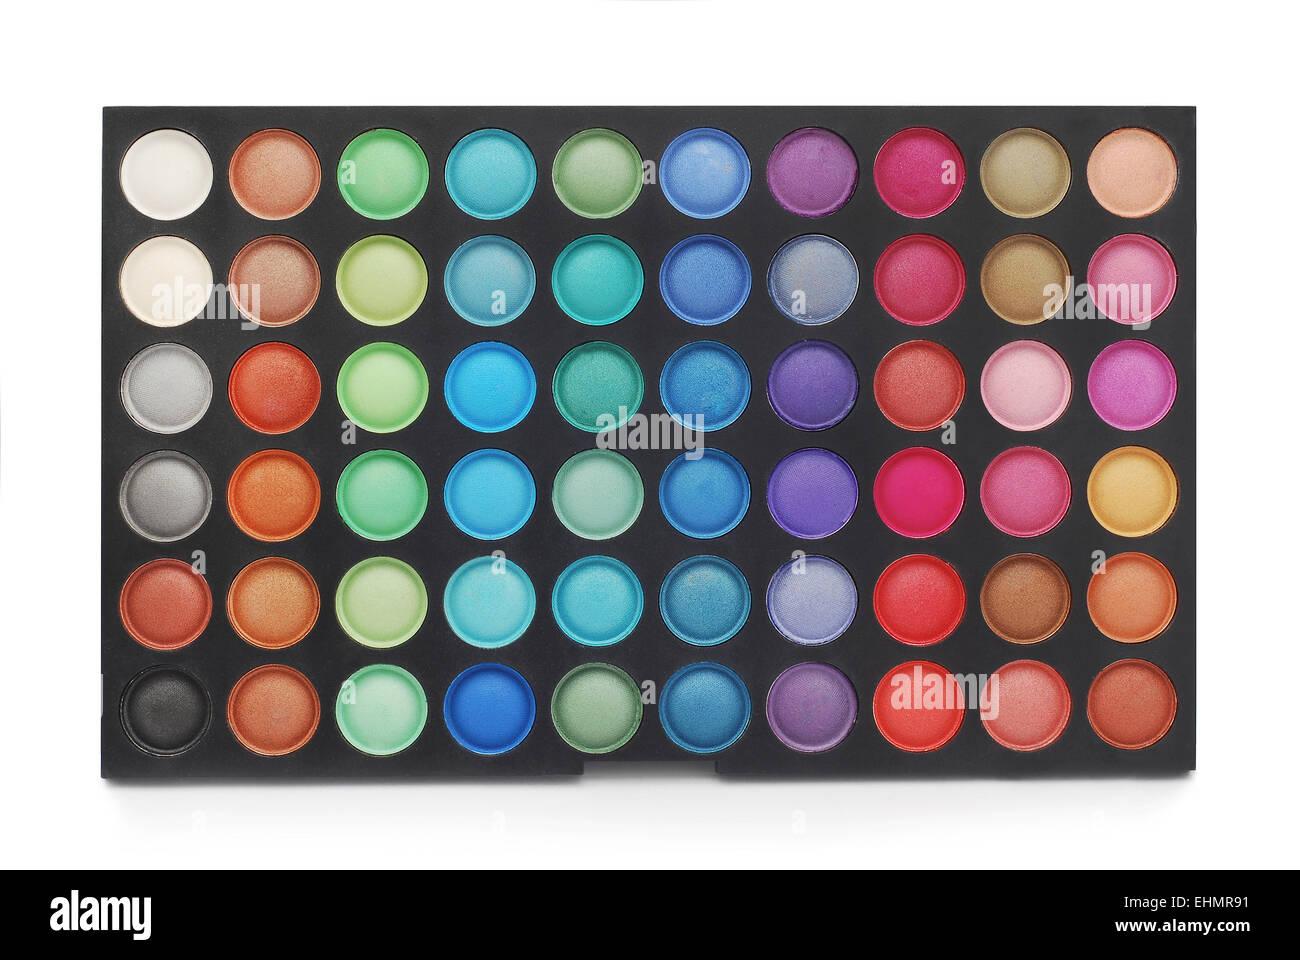 Palette de couleurs maquillage on white Photo Stock